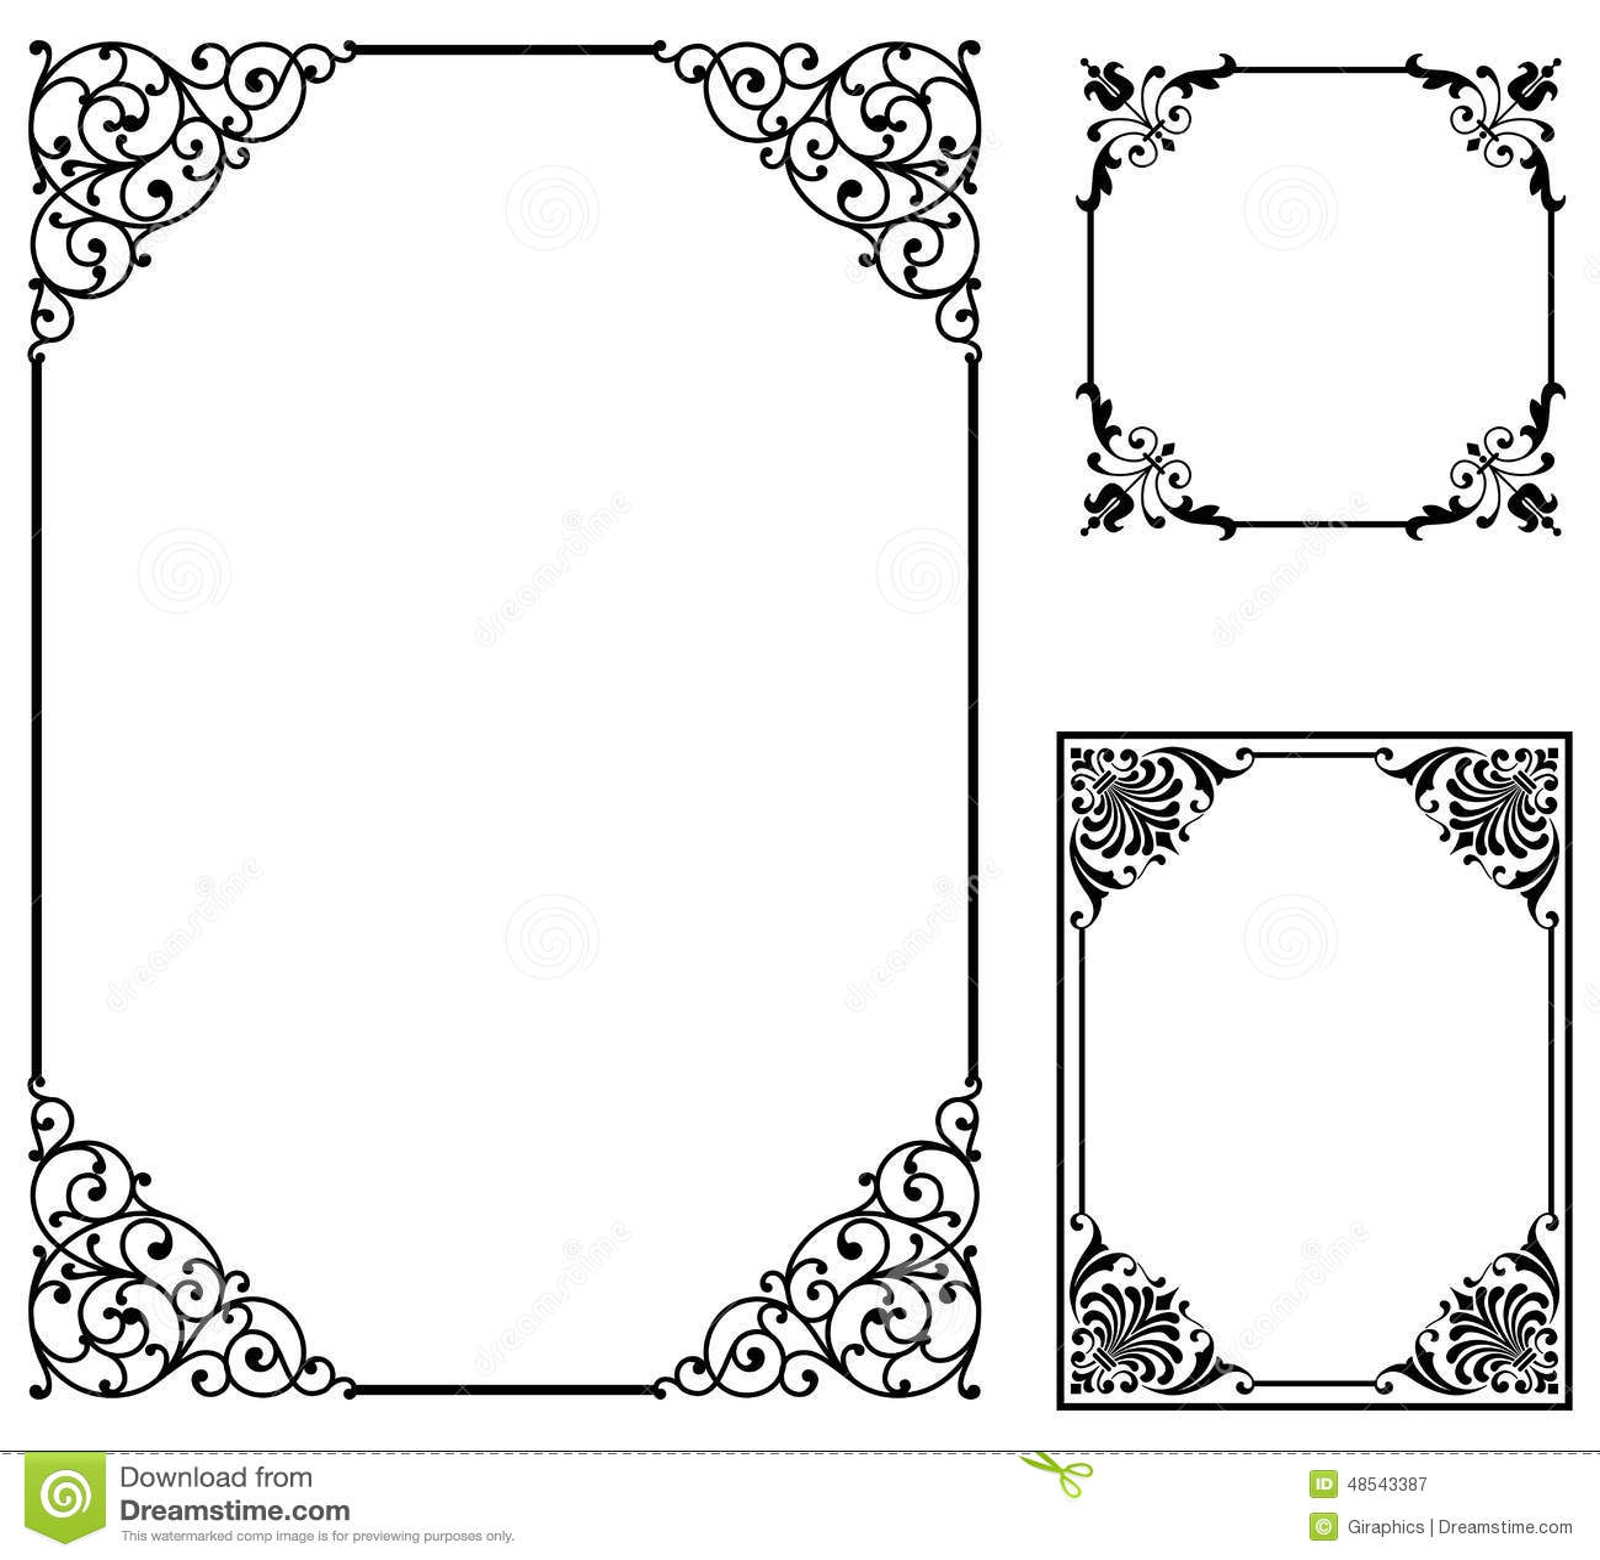 Scroll Frames stock vector. Illustration of certificate - 48543387